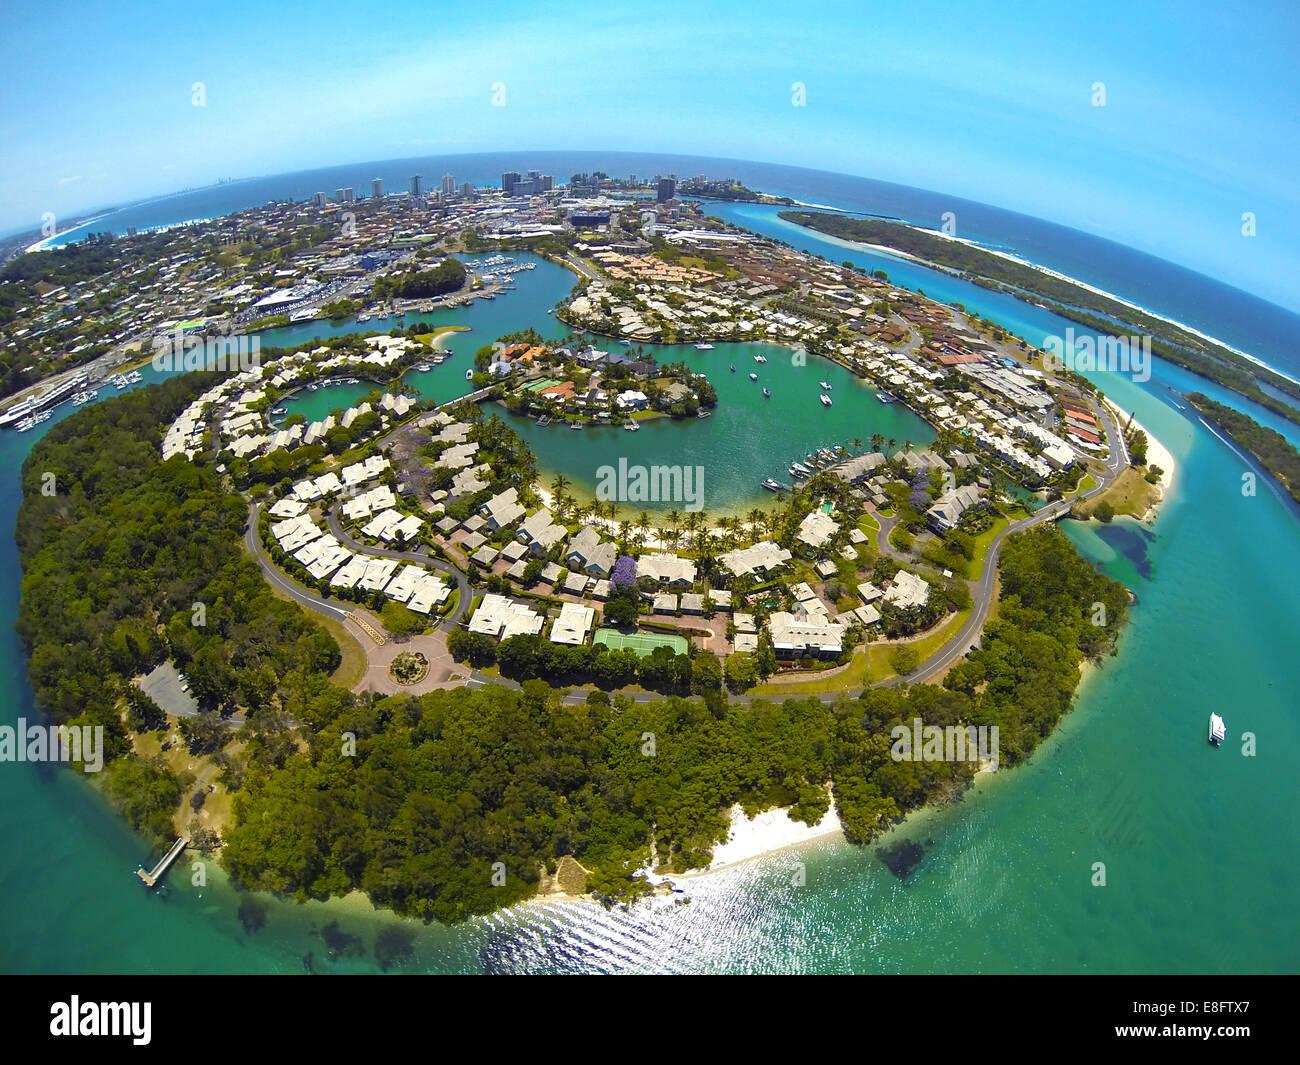 Australia, Greenbank, Aerial view of Terranora Creek - Stock Image